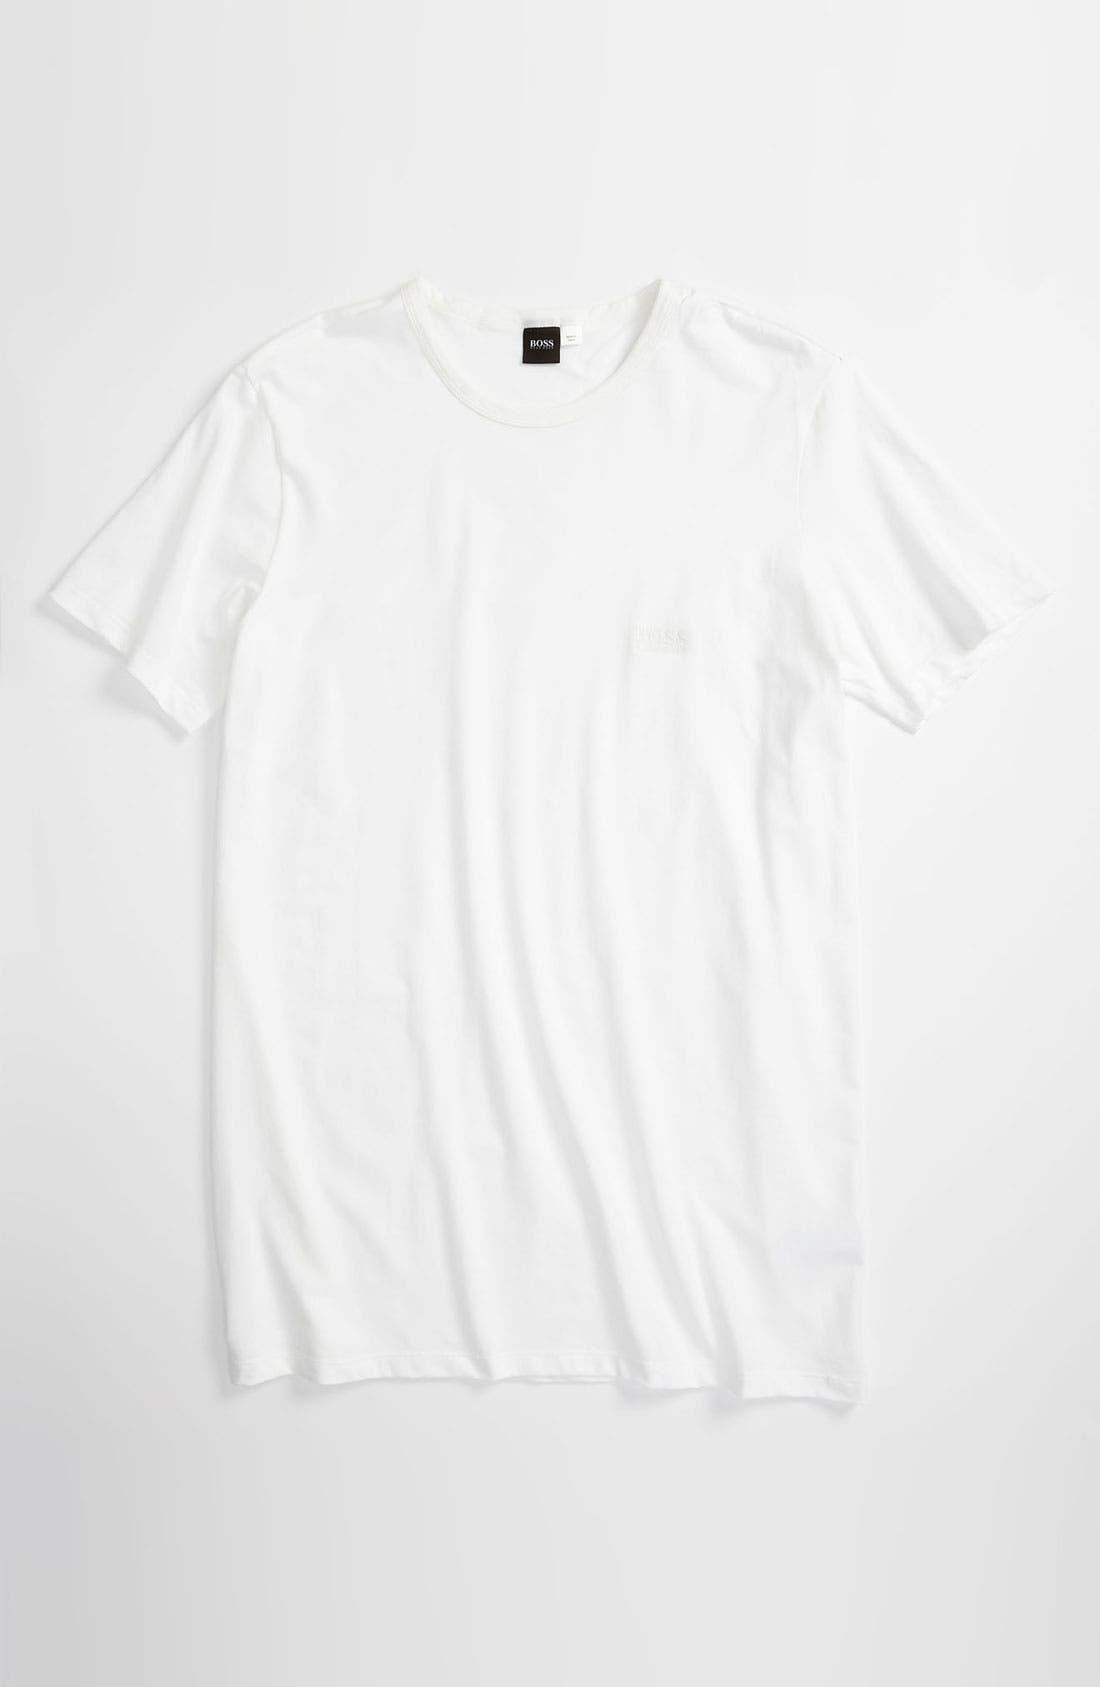 Main Image - BOSS HUGO BOSS Crewneck Stretch Cotton T-Shirt (Big) (Online Only)